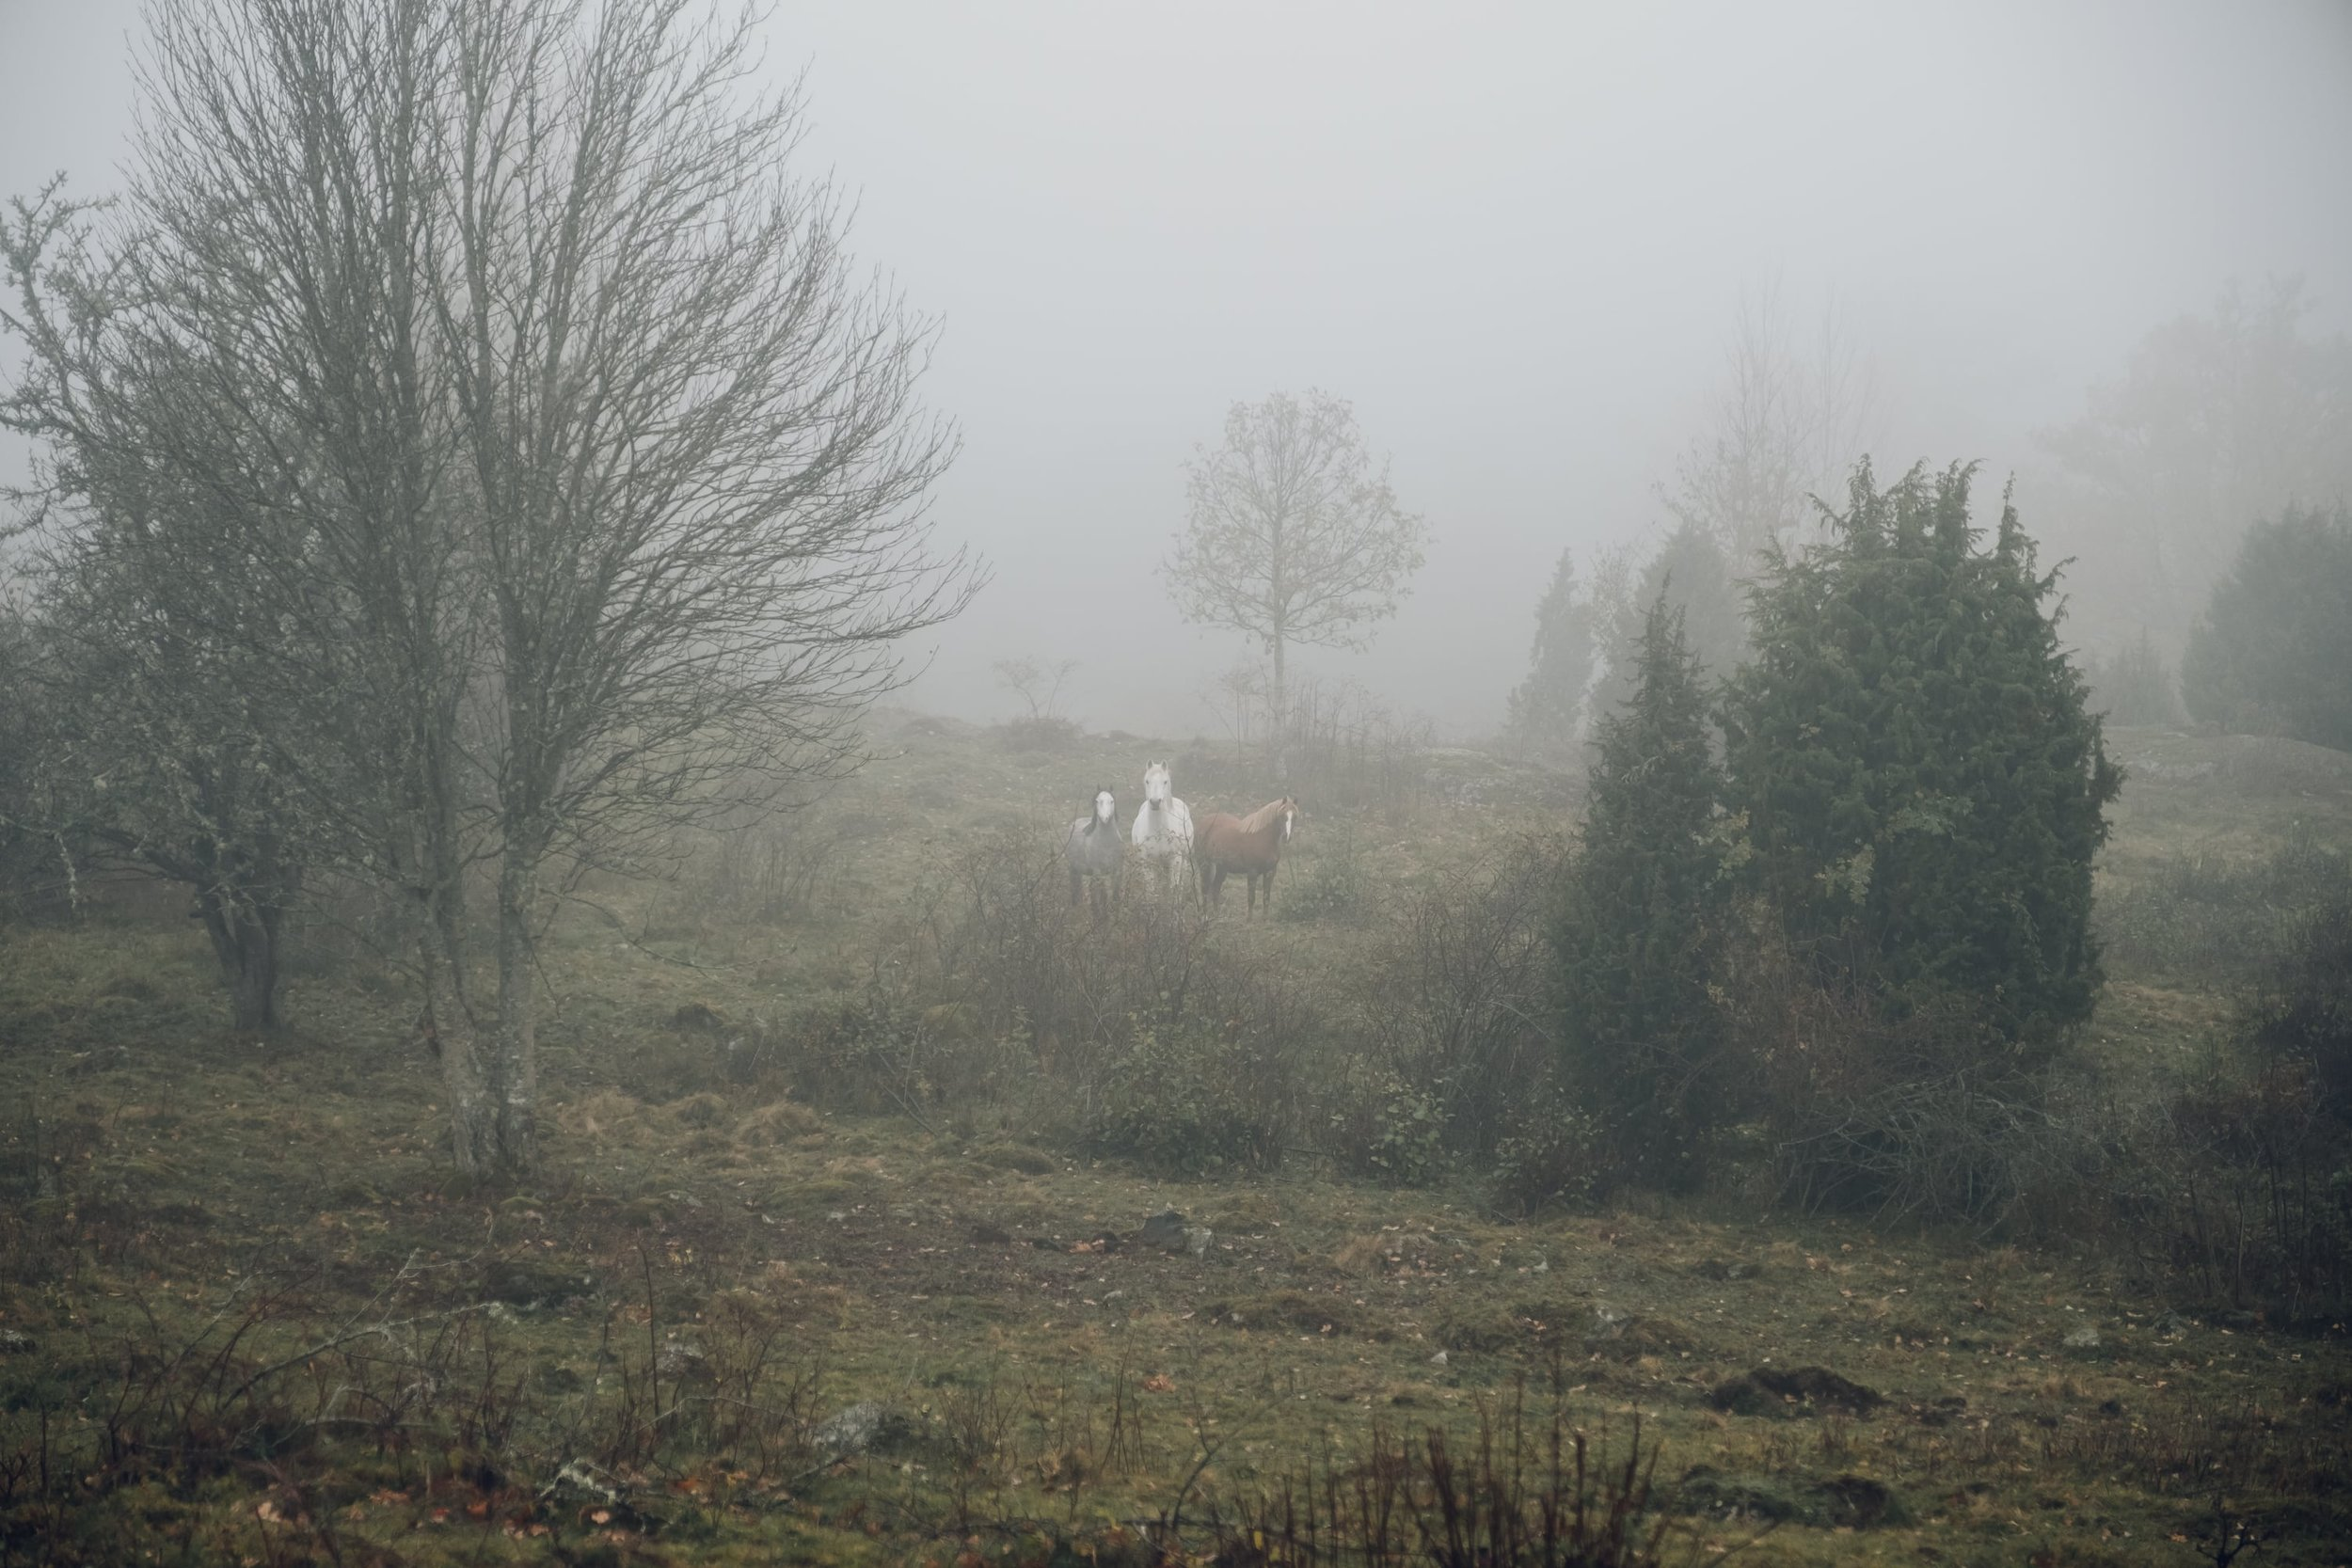 Wallby Sateri in Vetlanda, Sweden by Haarkon